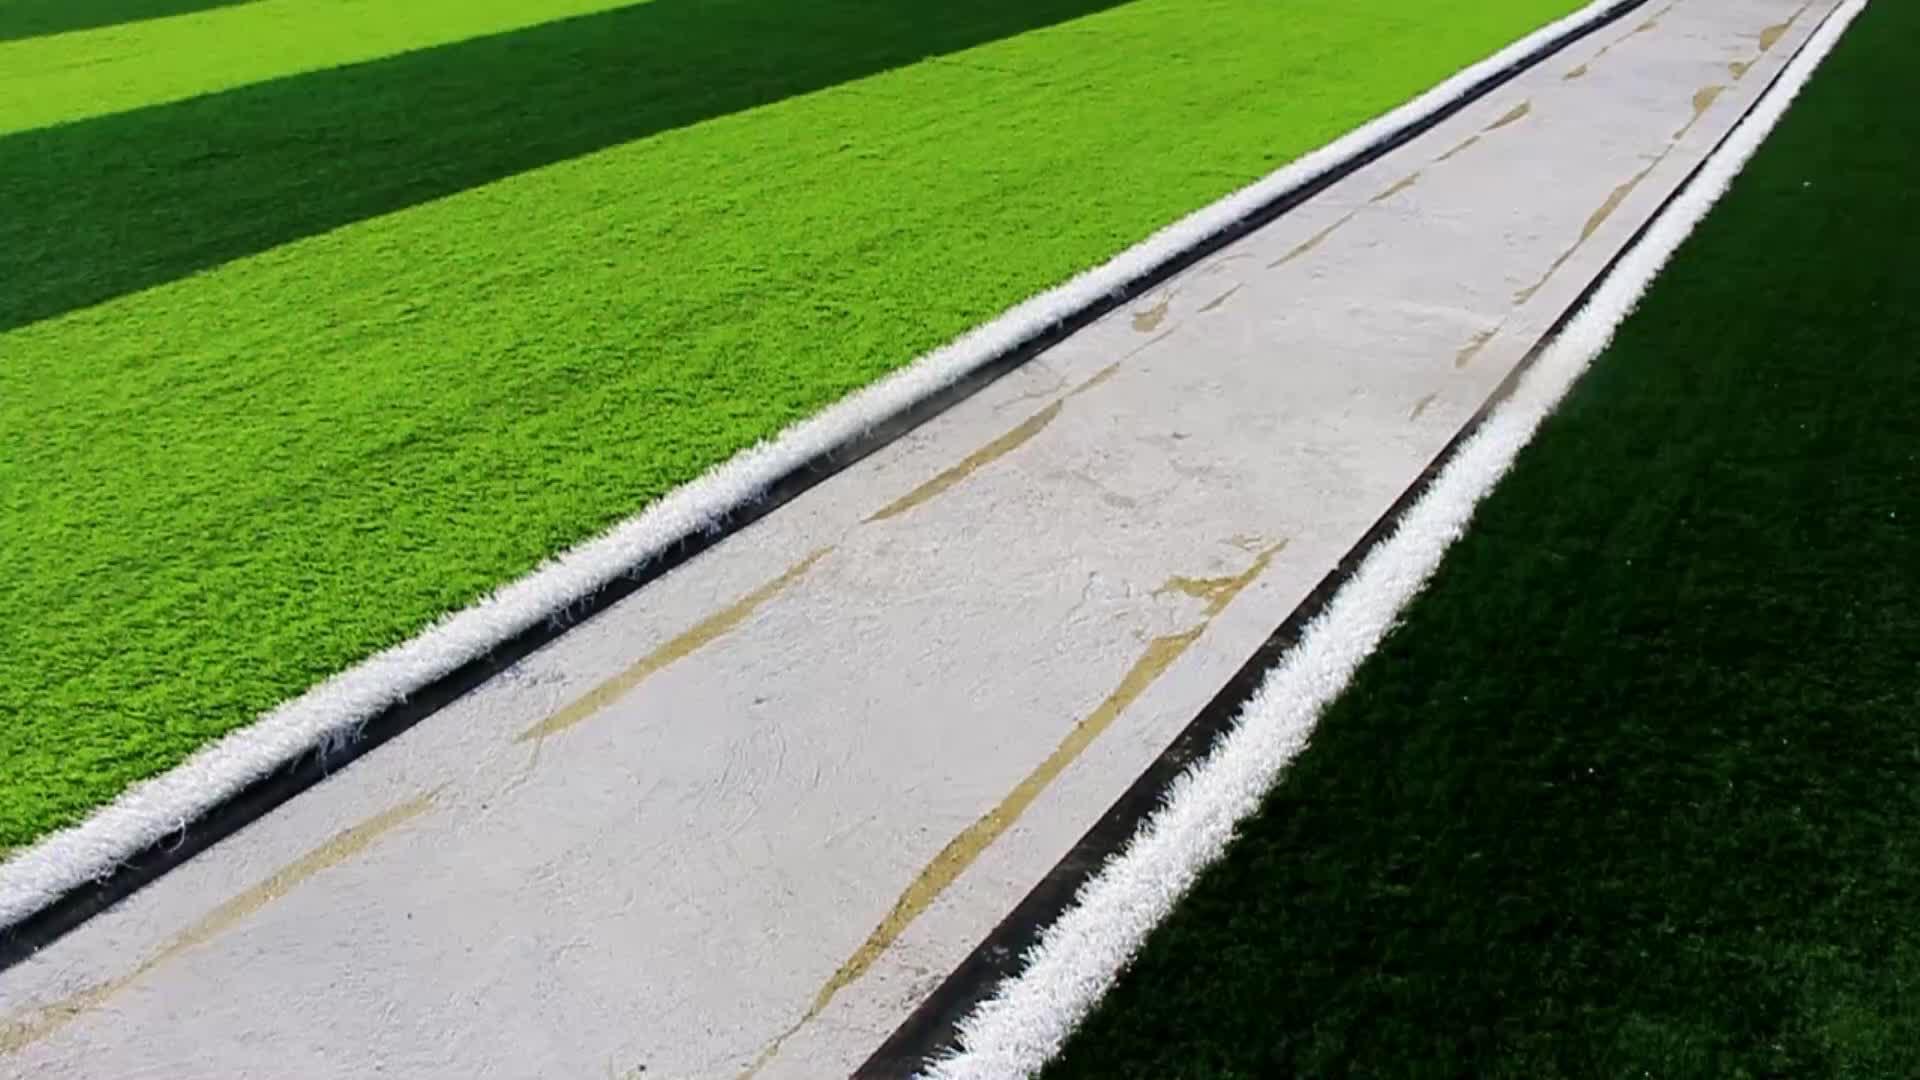 50mm por atacado de futebol de grama sintética grama artificial